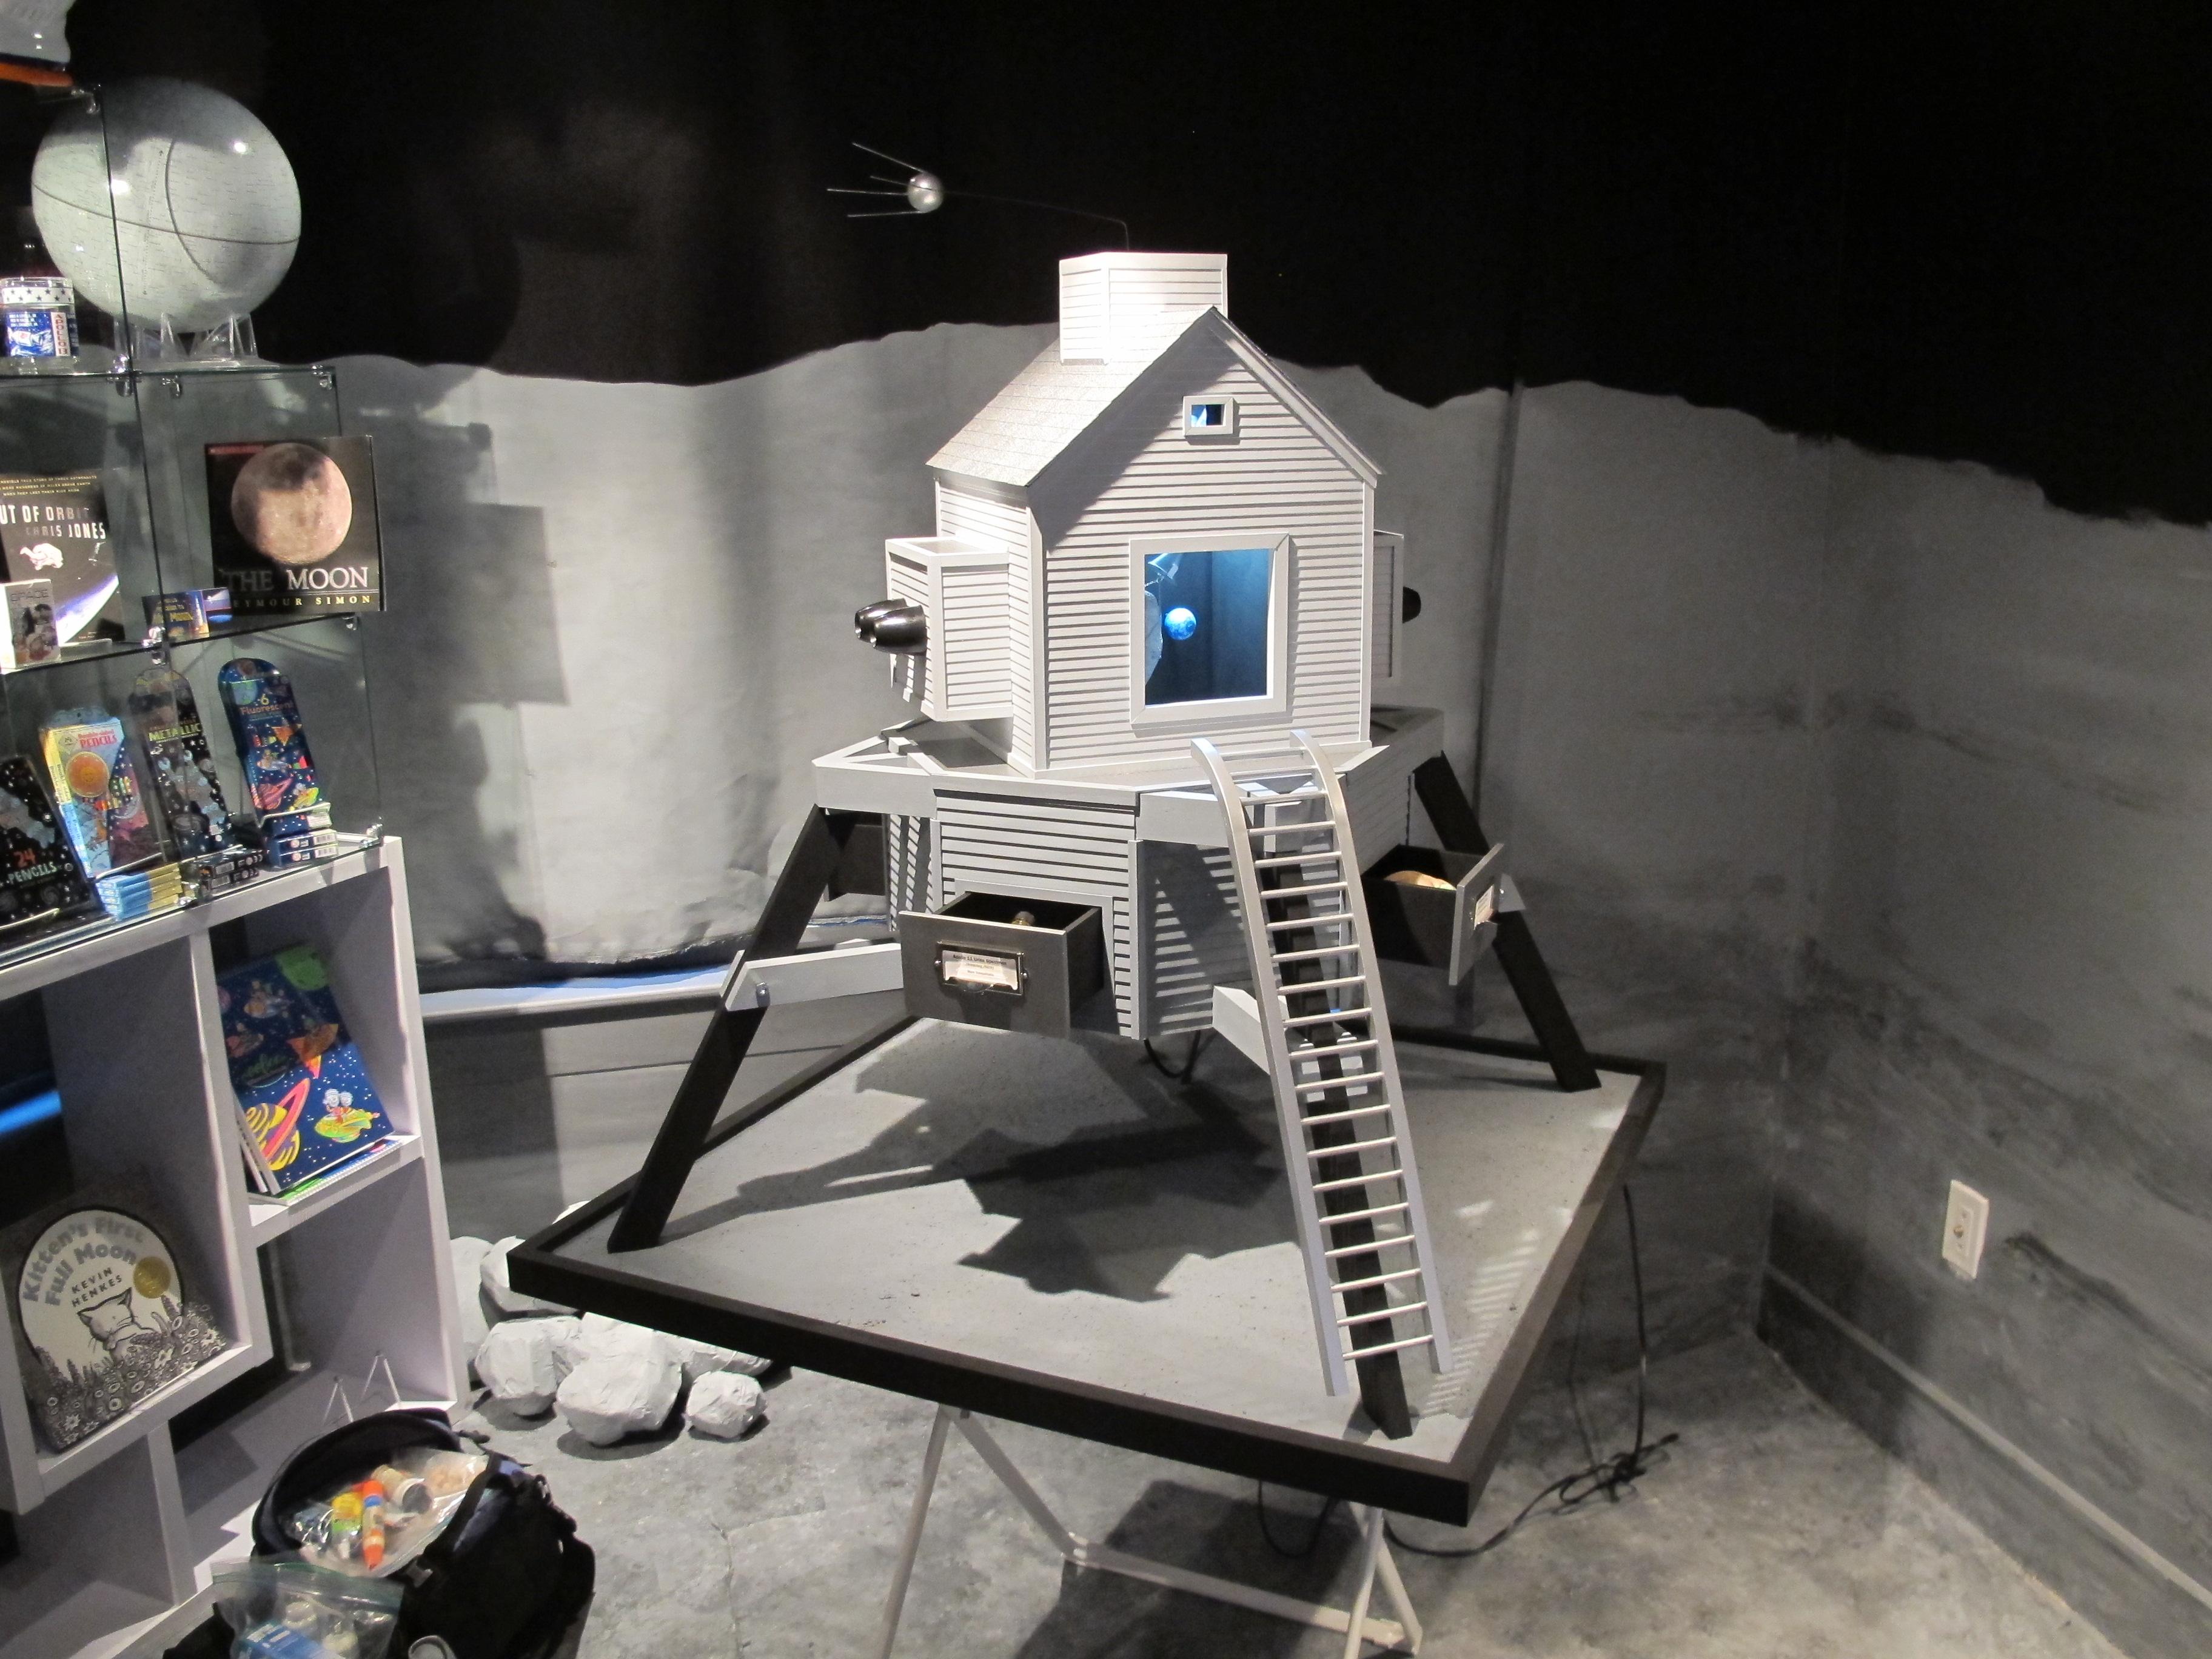 The Moon Room!